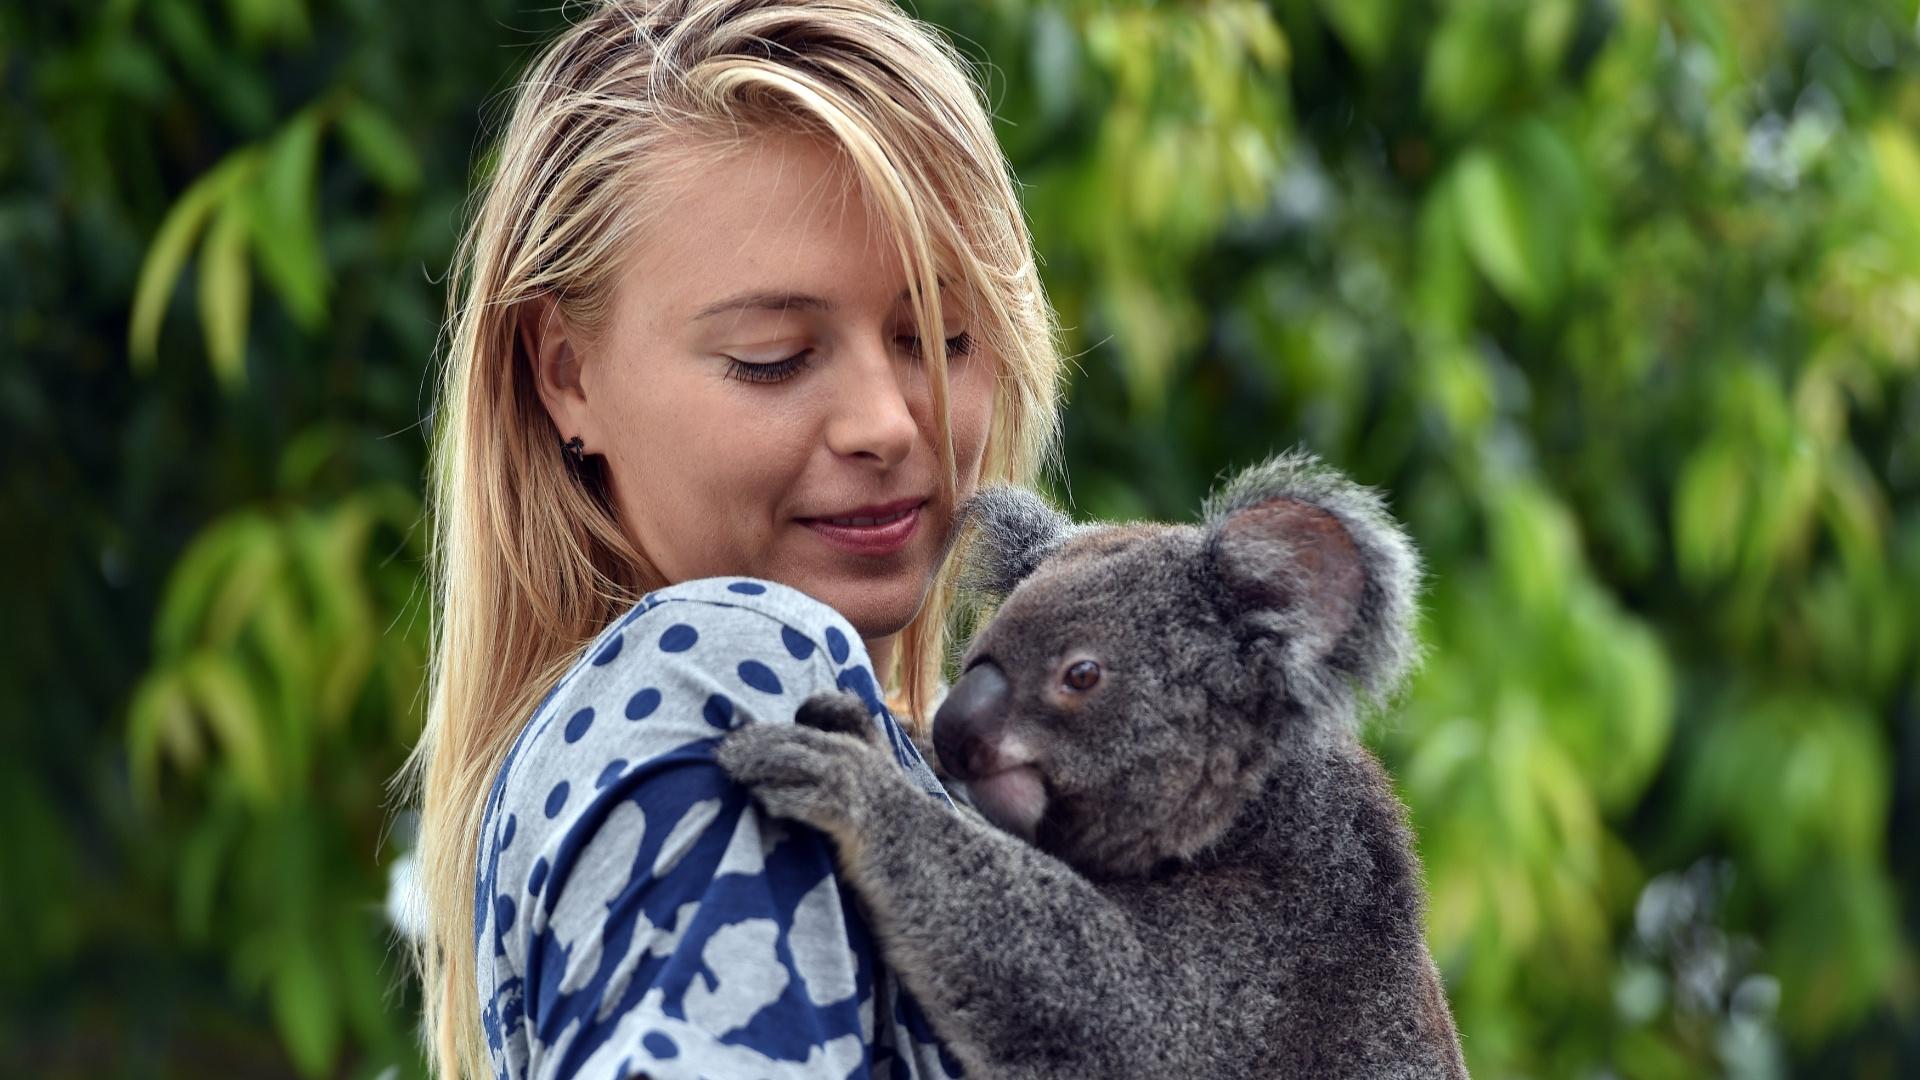 7.jan.2015 - A tenista russa Maria Sharapova posa com o coala